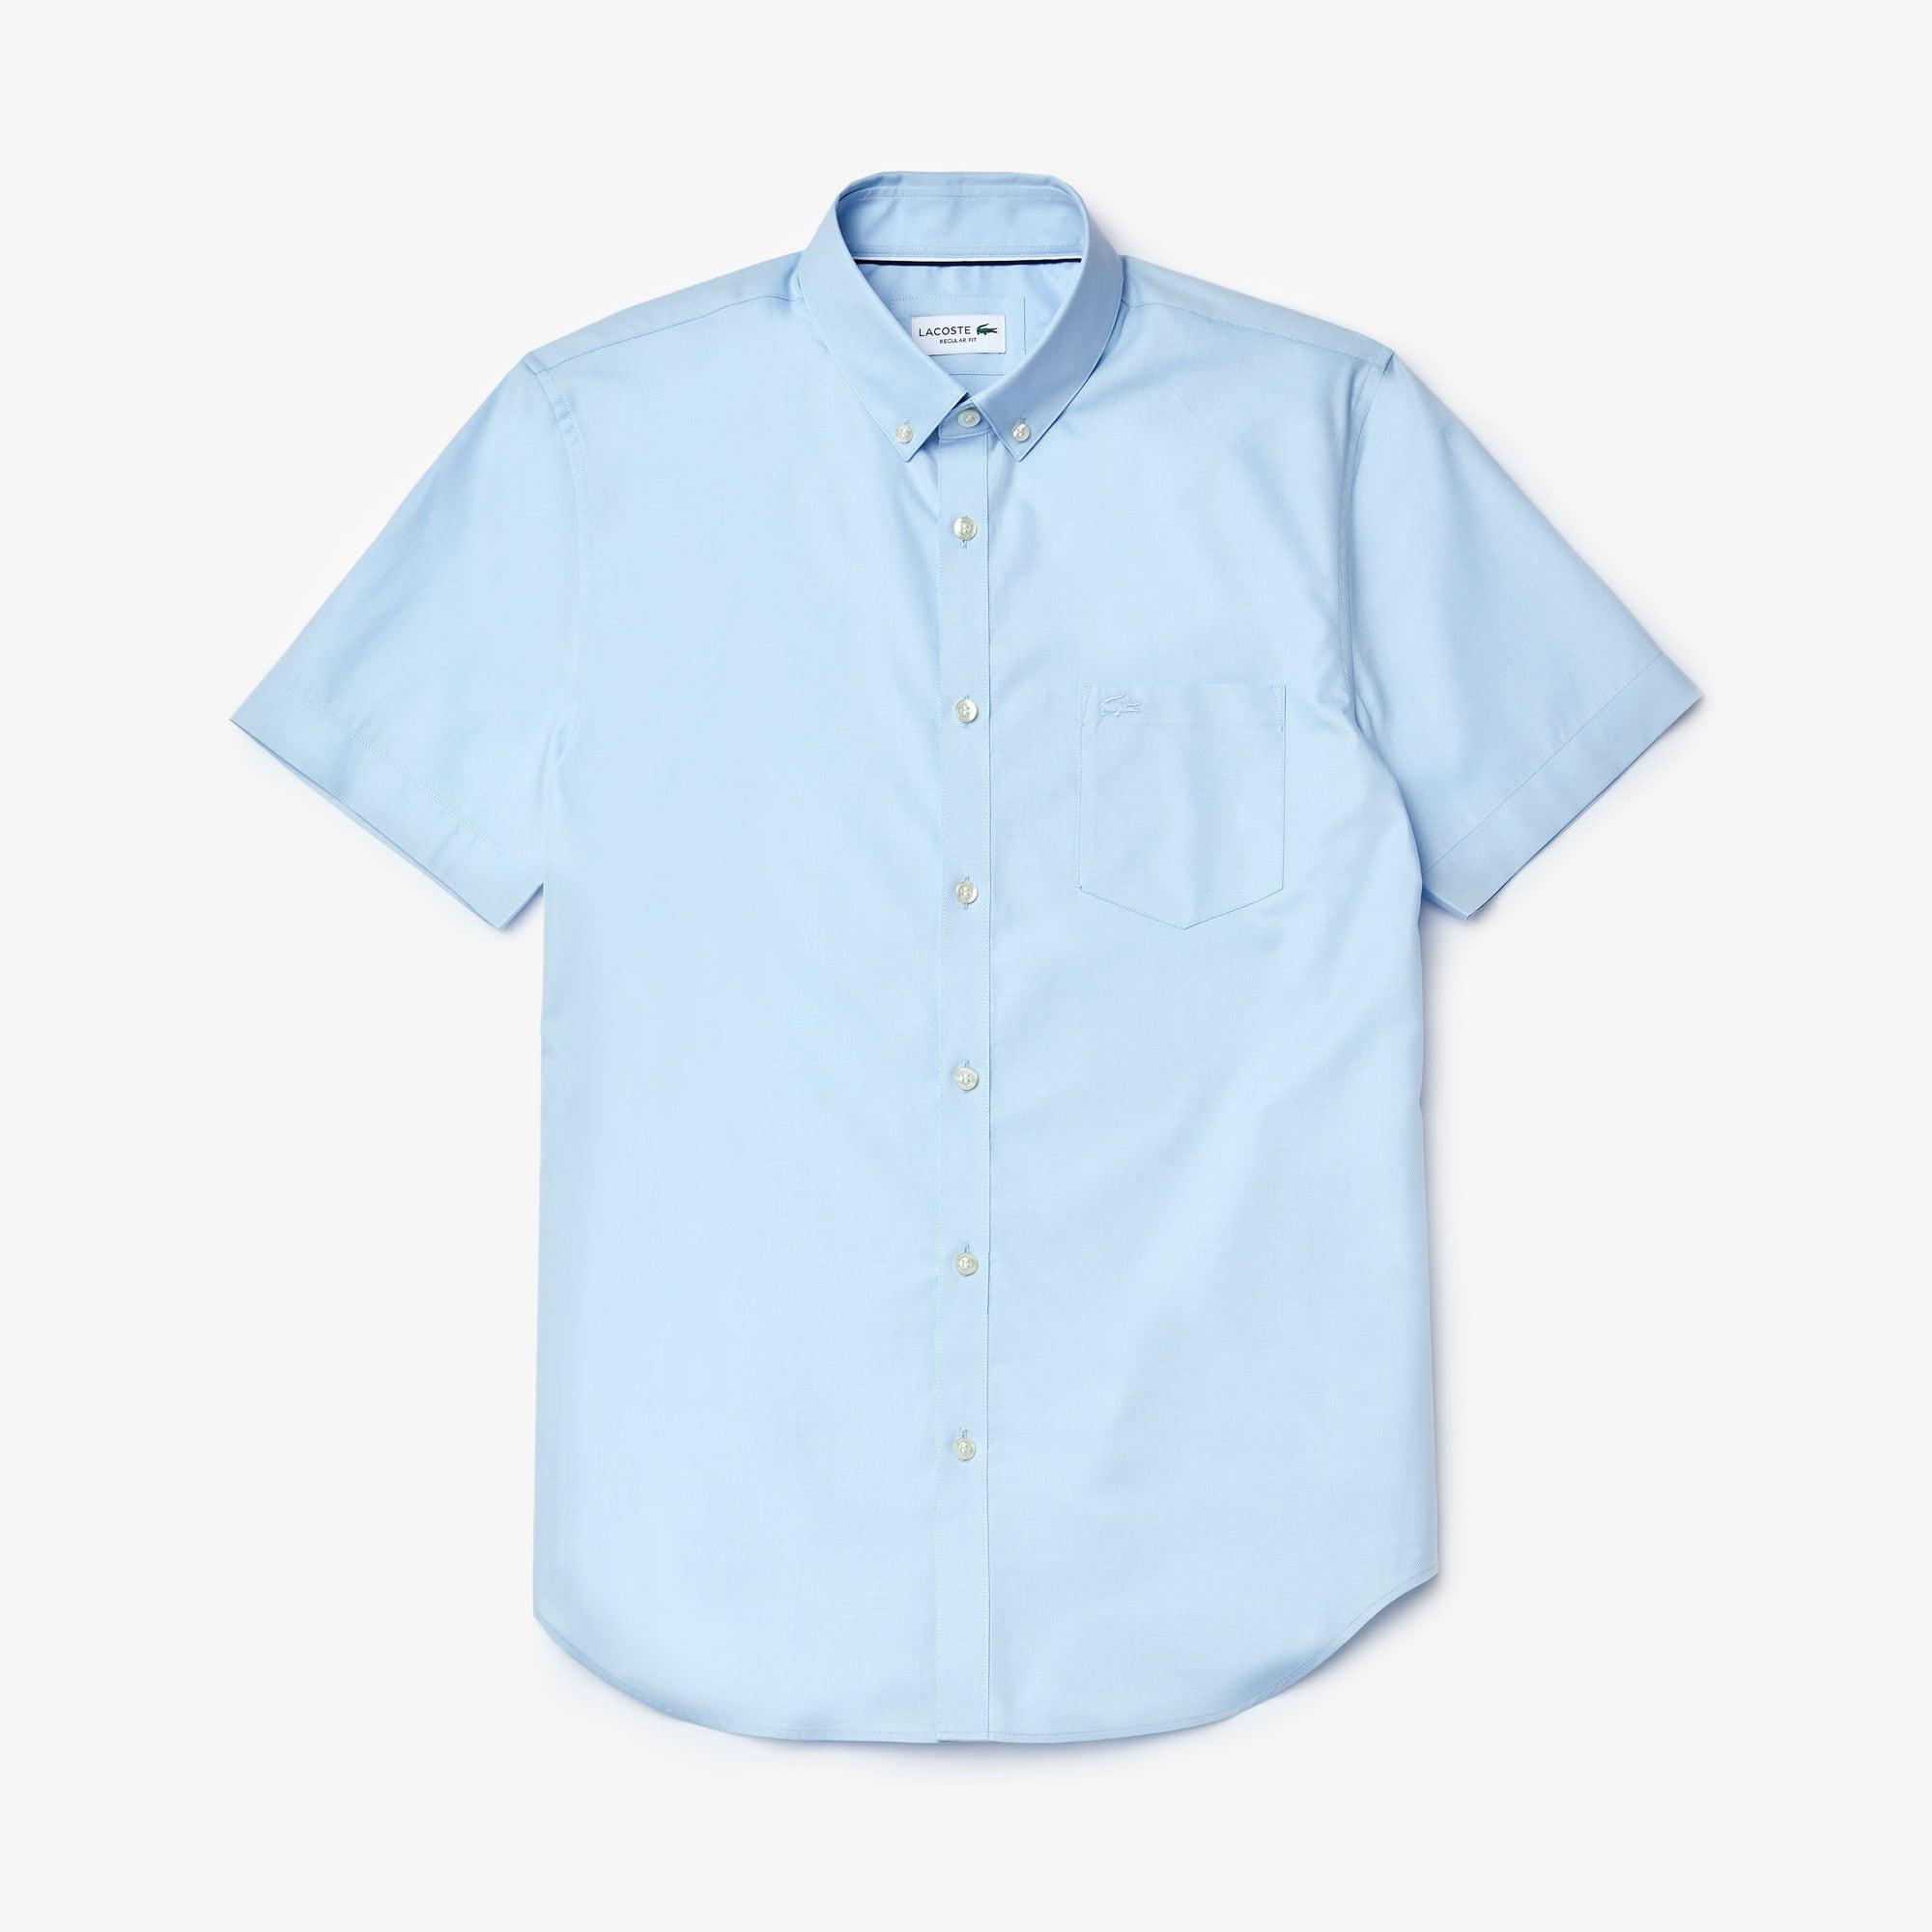 Regular Fit Herren-Hemd aus Mini-Piqué